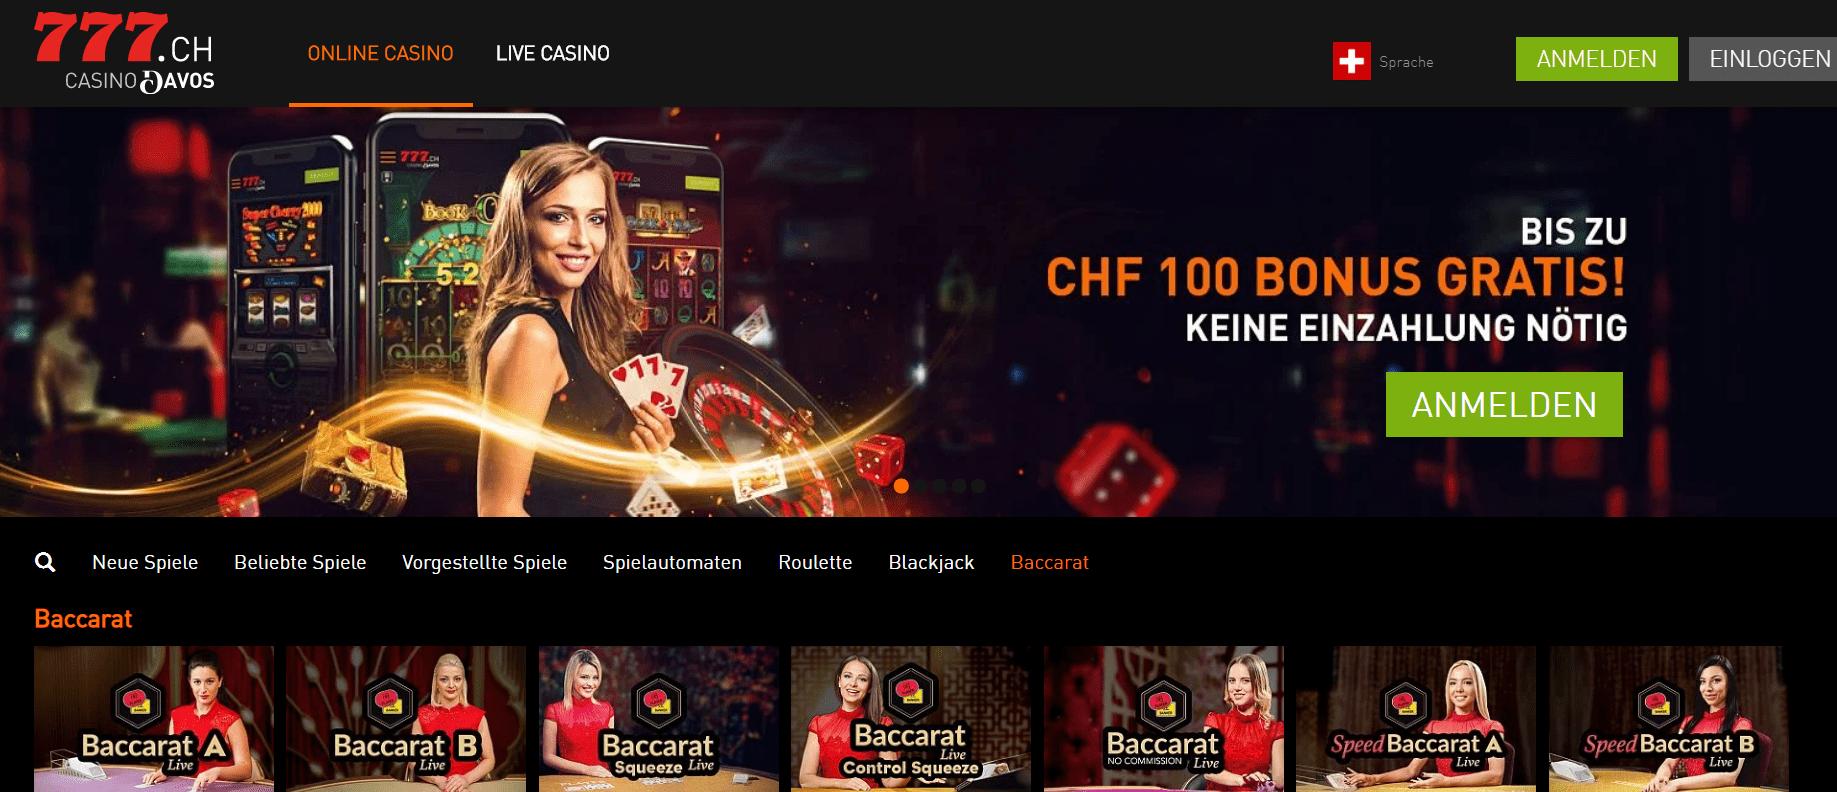 Casino777-ch-baccarat